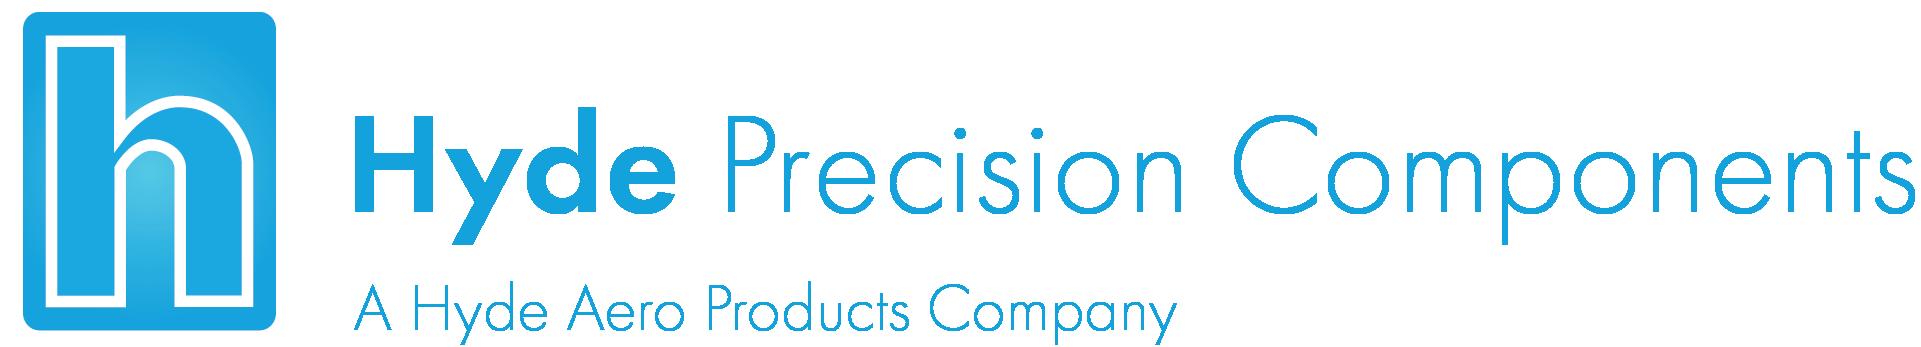 Hyde Precision Components Logo.png